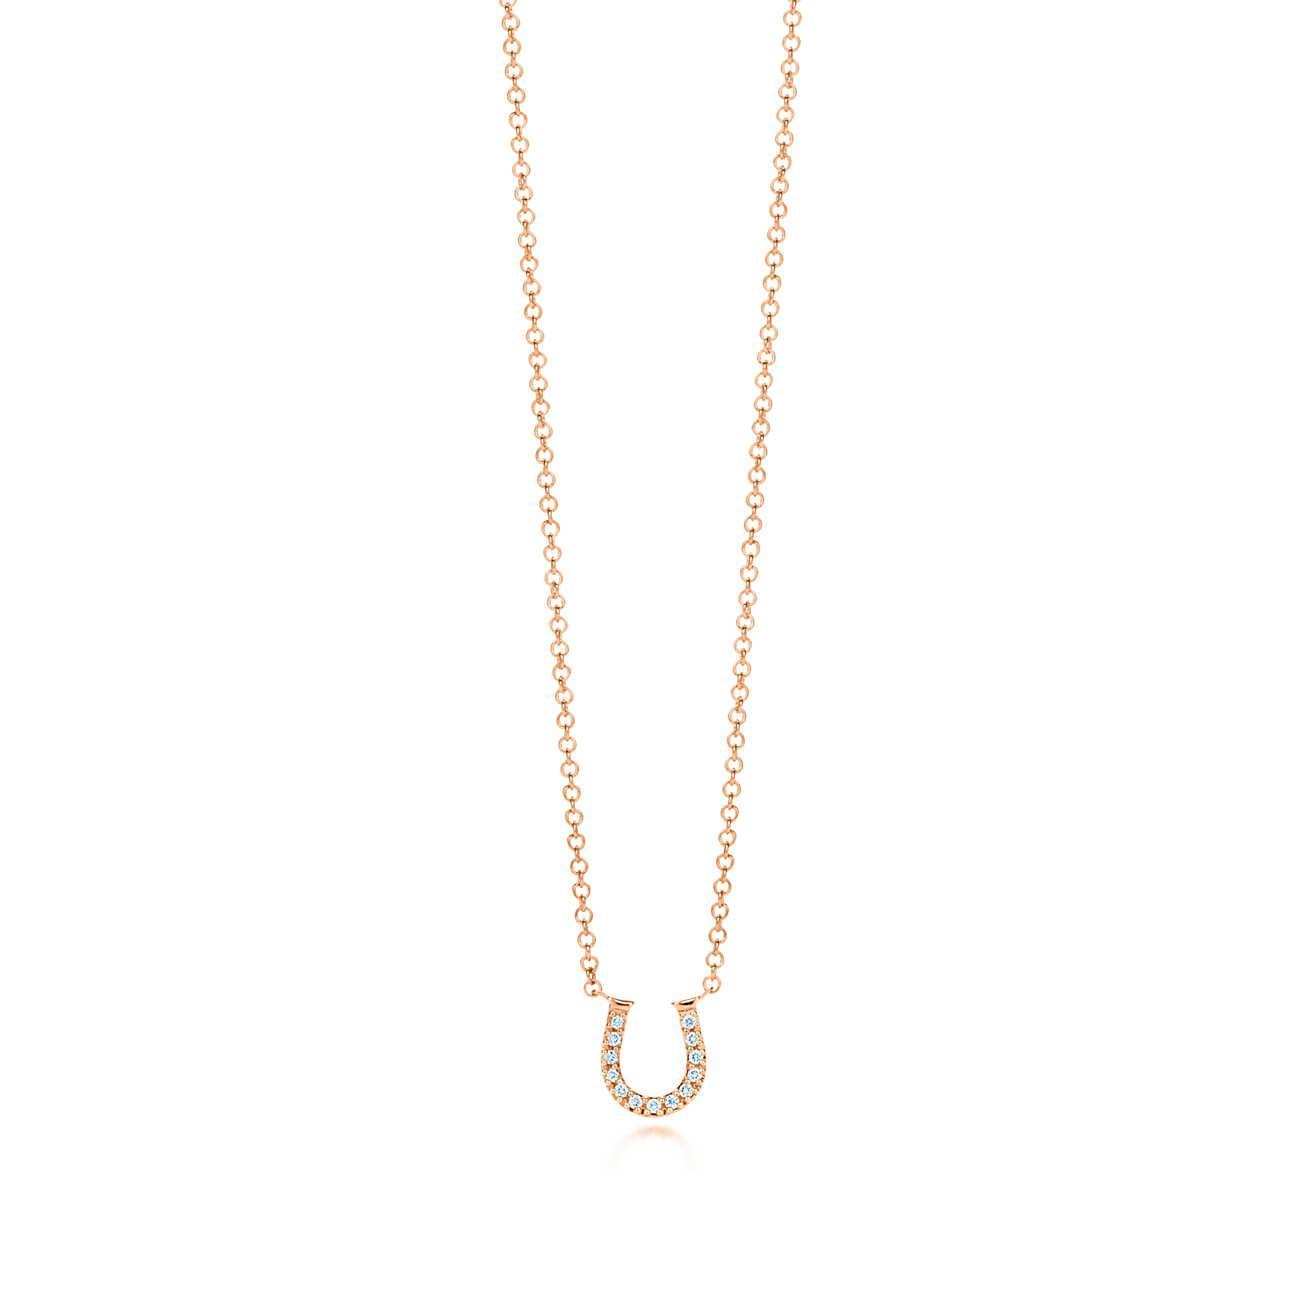 Horseshoe pendant in 18k rose gold with diamonds, mini - Size Tiffany & Co.